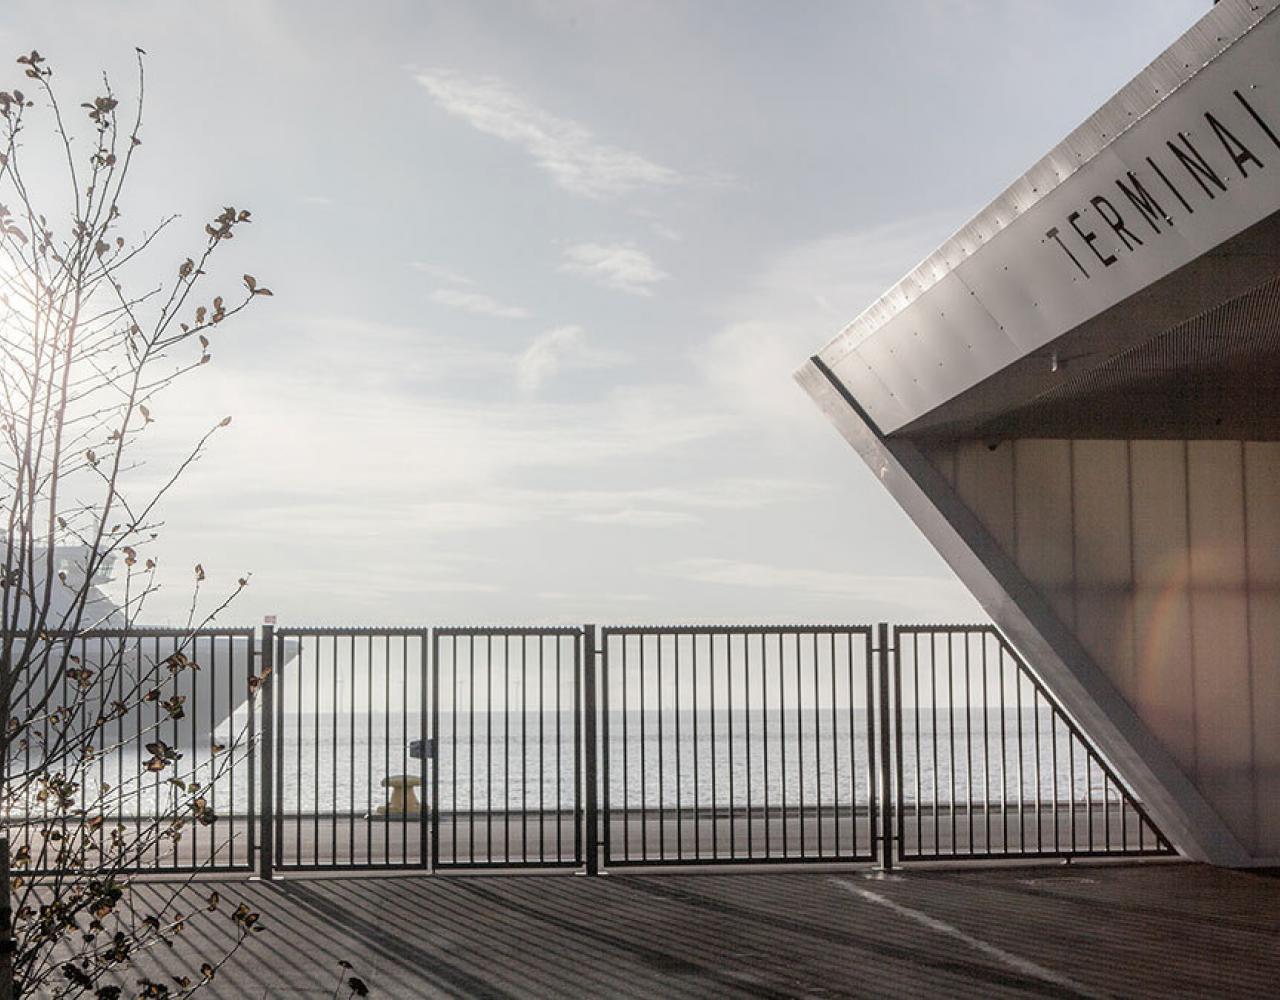 Terminalerne, Øresund, padeltennis